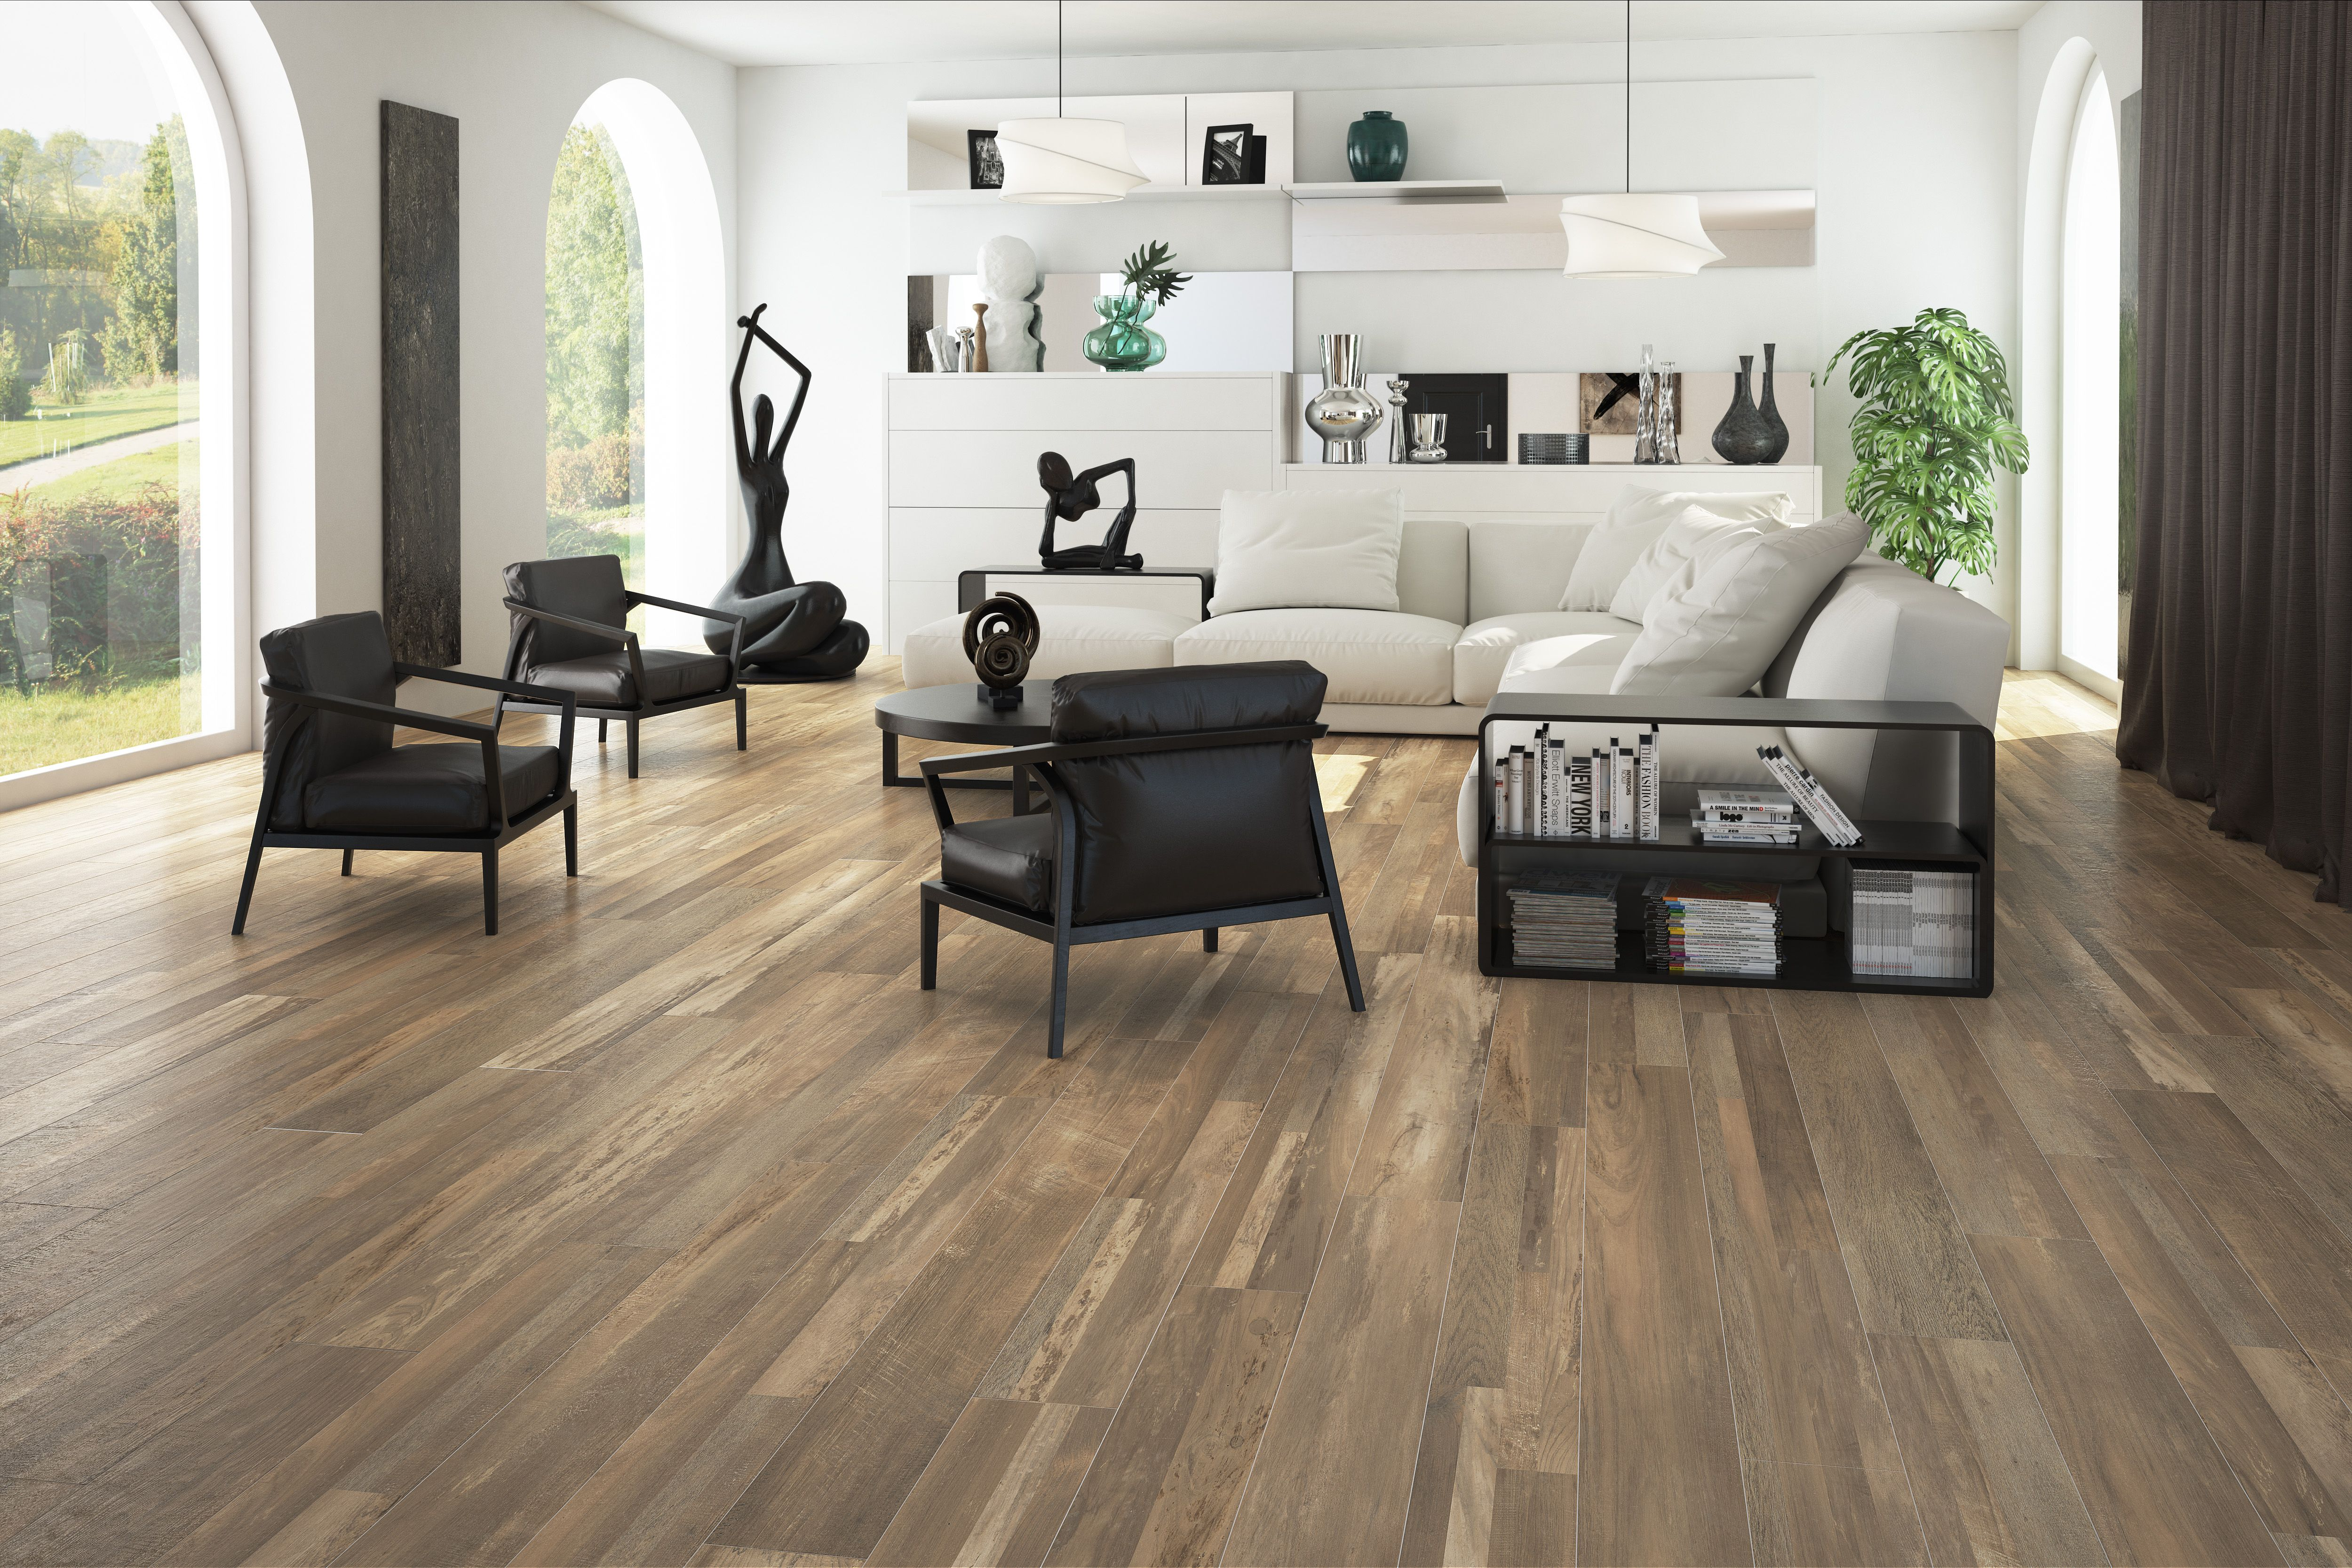 REVOLT Collection   COLORKER #colorker #livingroom #tiles #porcelain  #woodeffect #decor